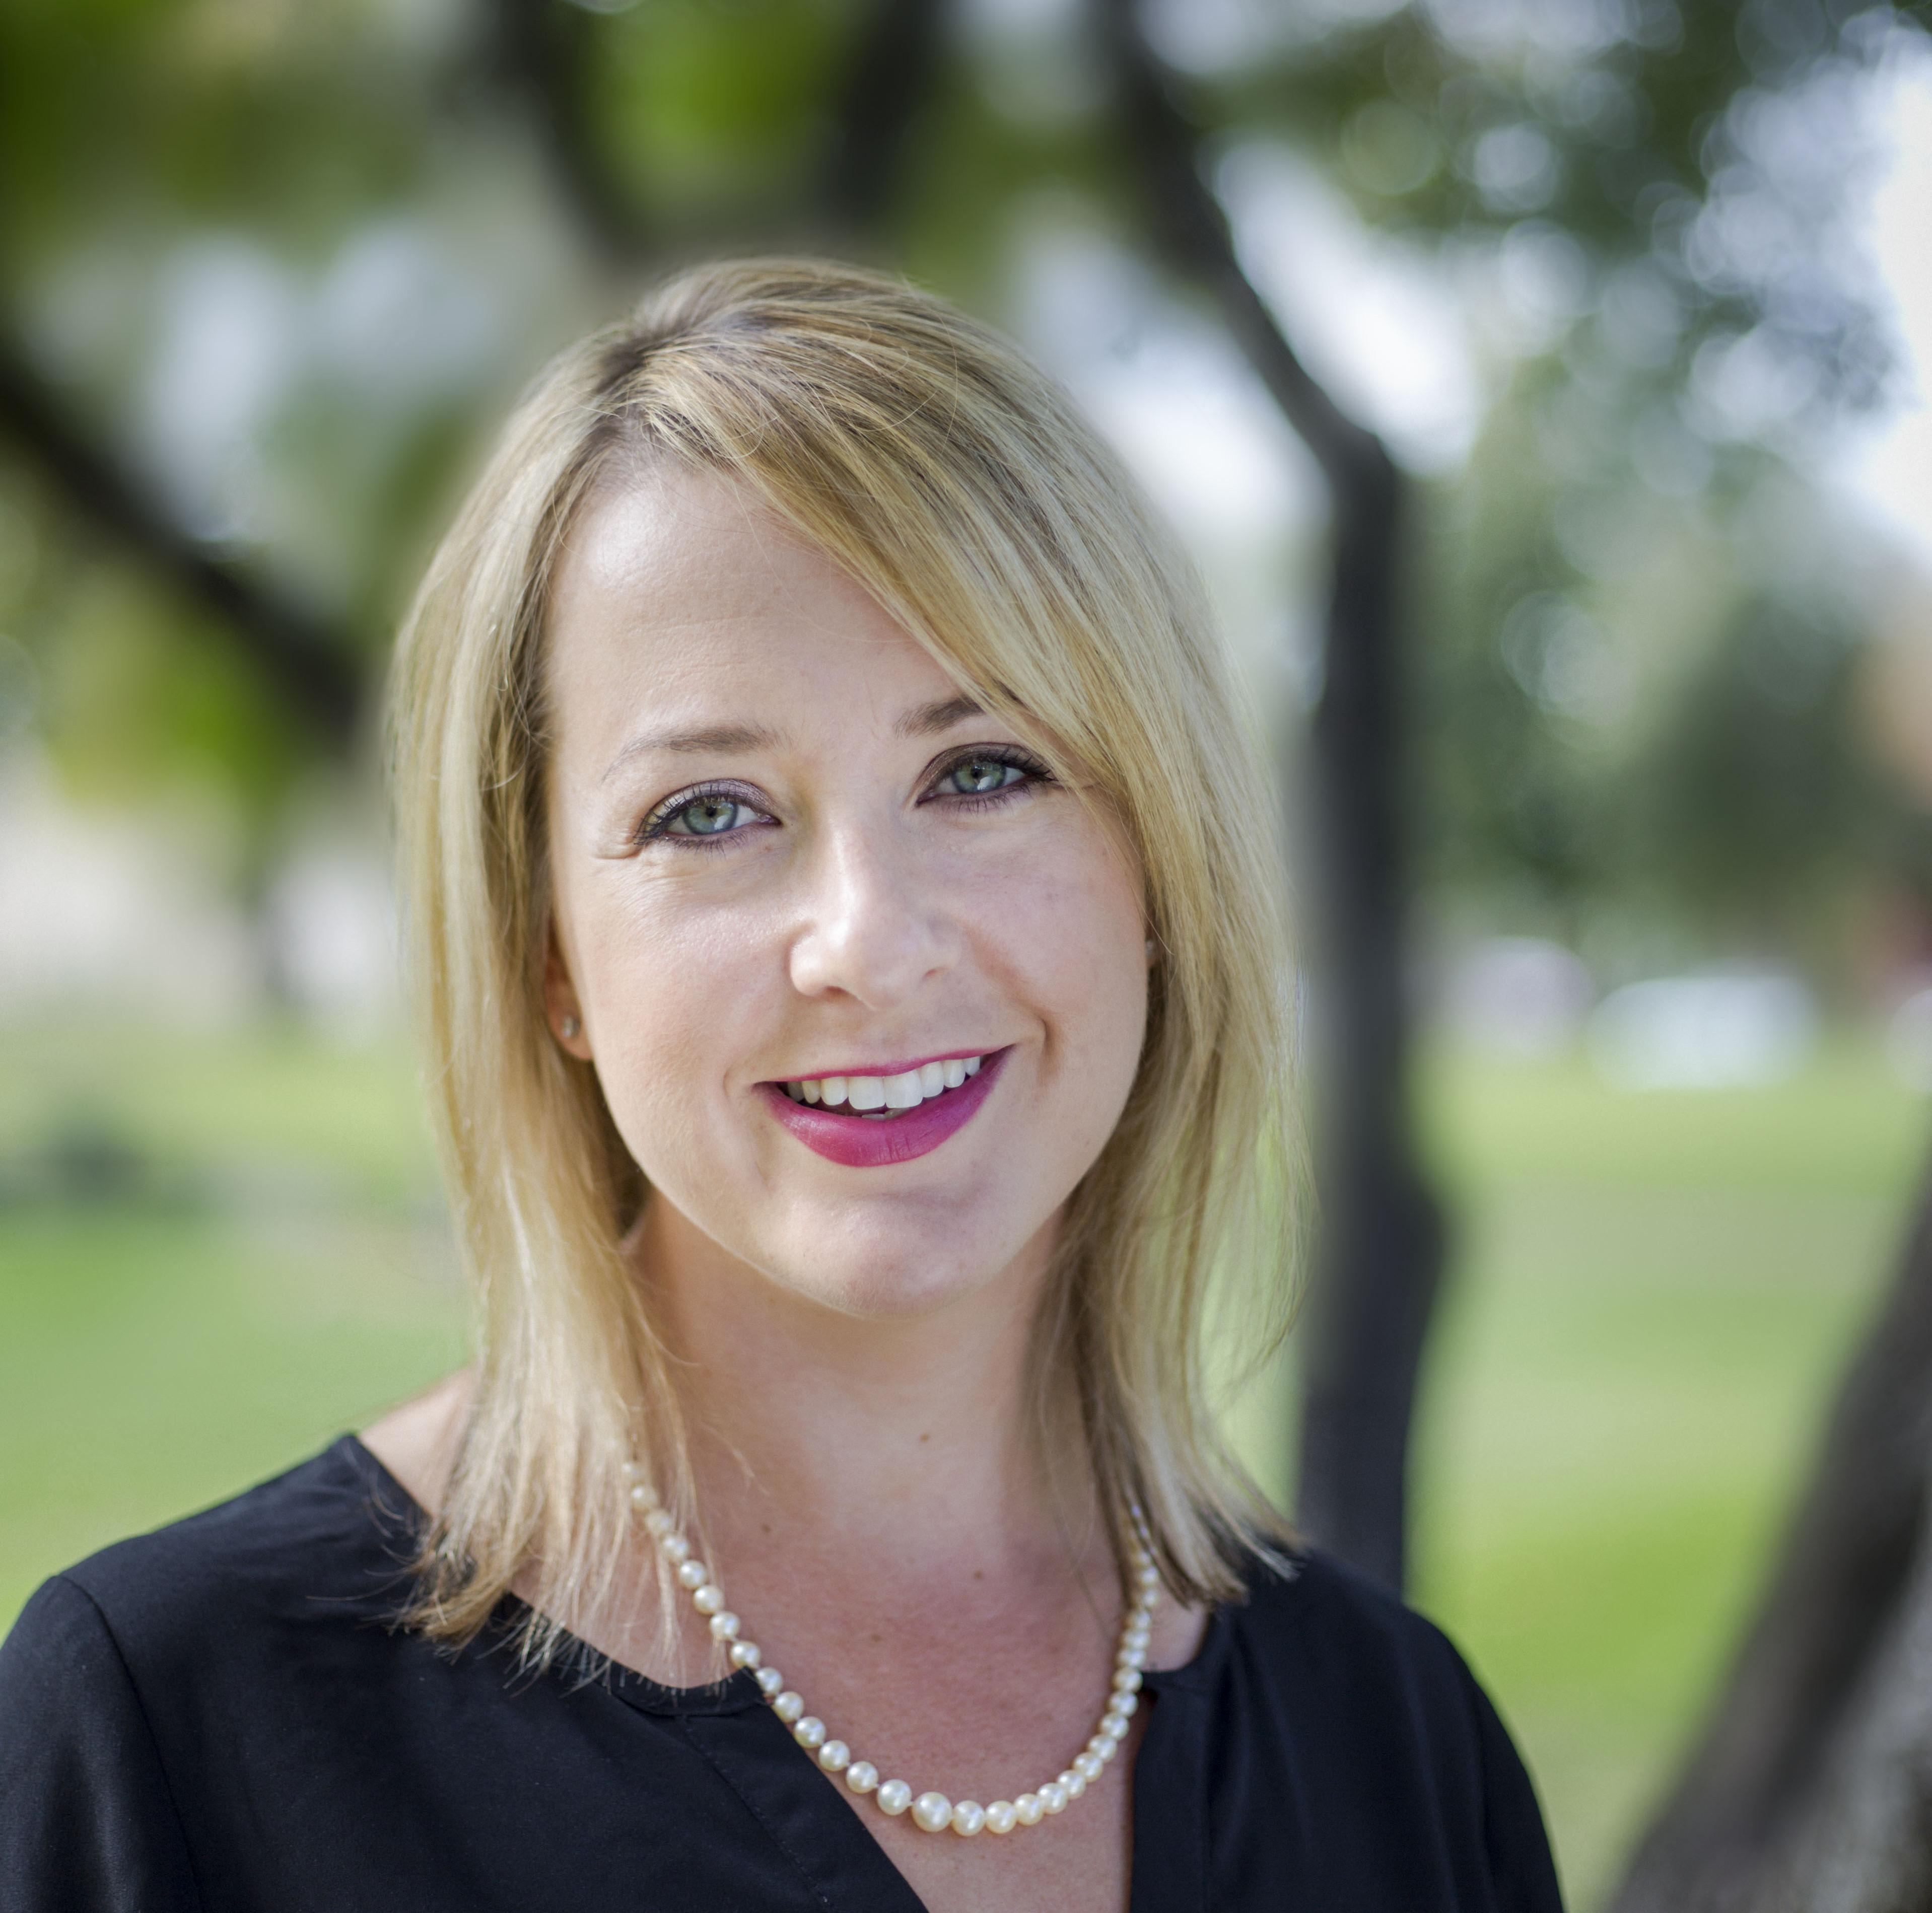 Dr. Sarah Payne of South Denver OB/GYN, obstetrics and gynecology